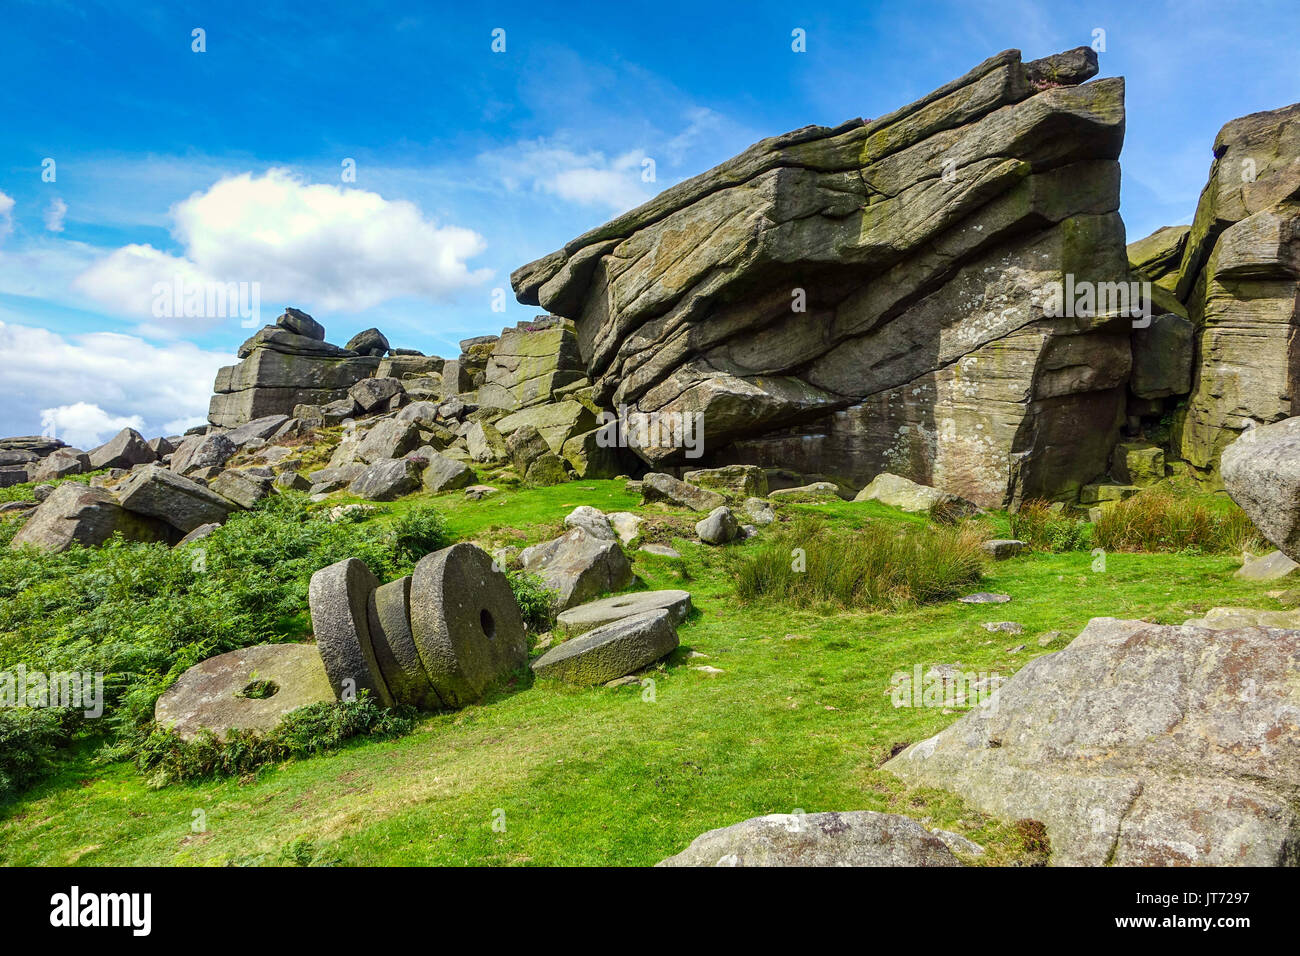 Abandoned millstones, below Stanage Edge, Peak District, Derbyshire - Stock Image